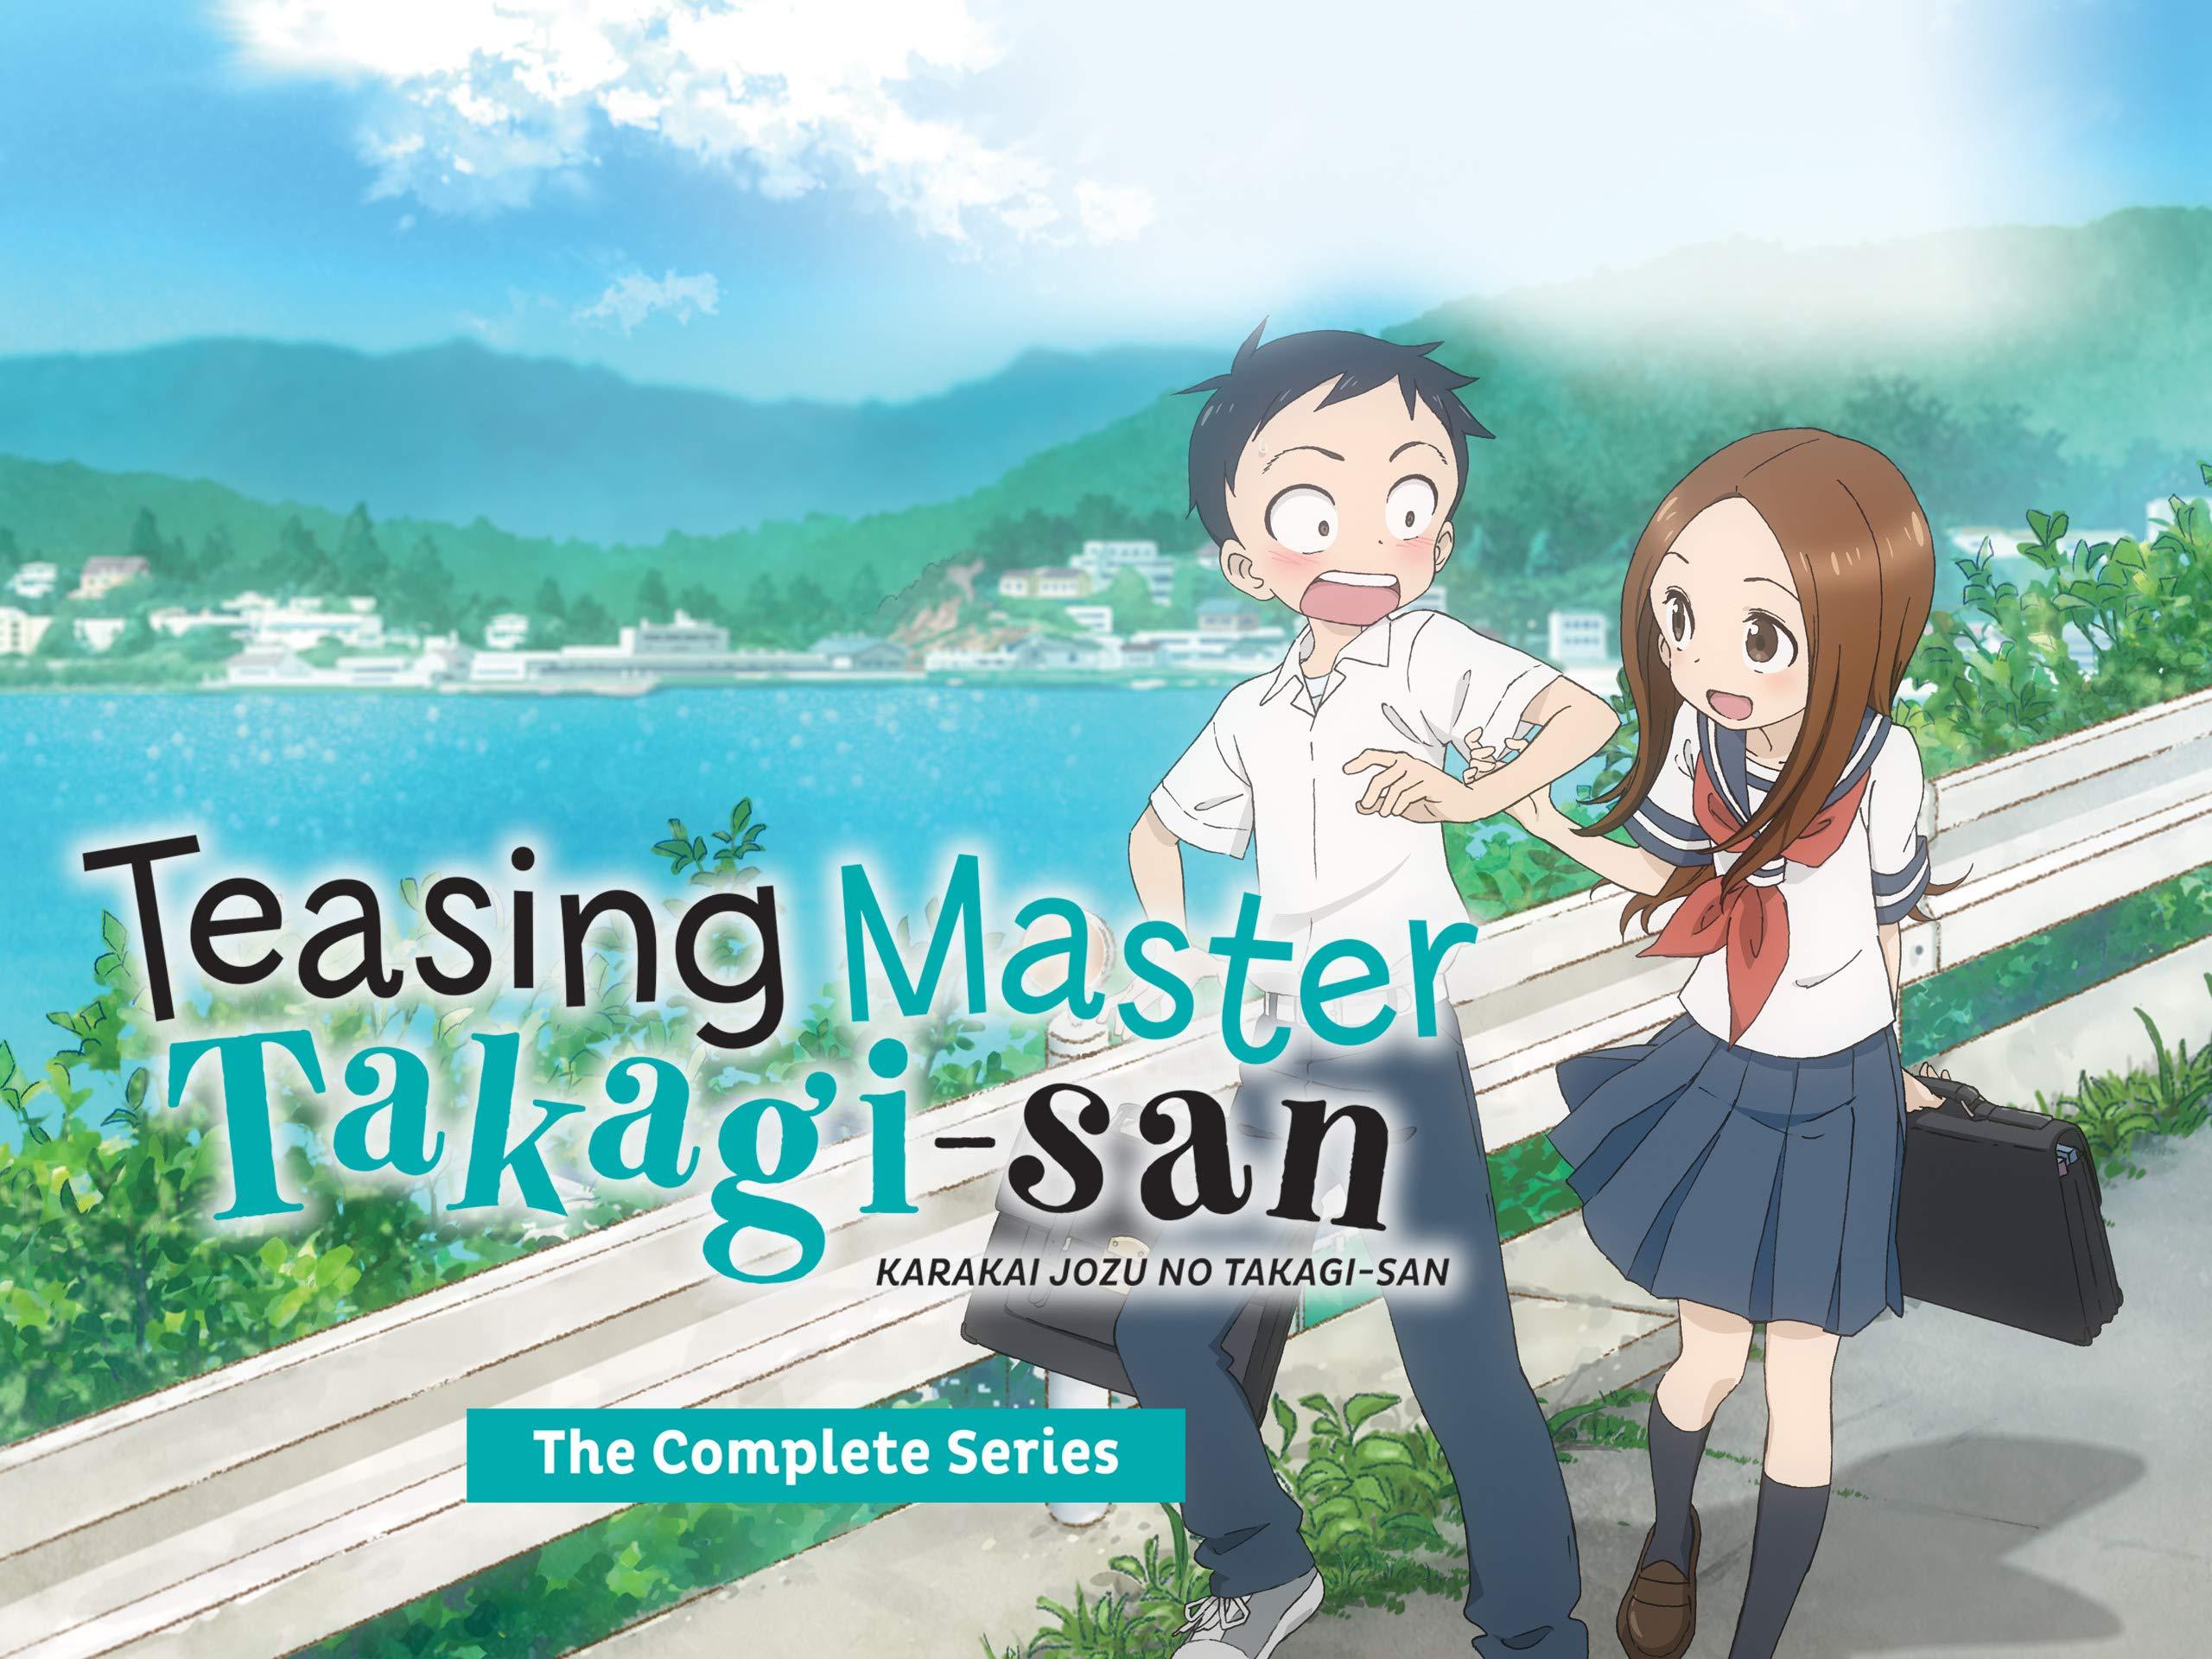 Watch Teasing Master Takagi San Karakai Jozu No Takagi San